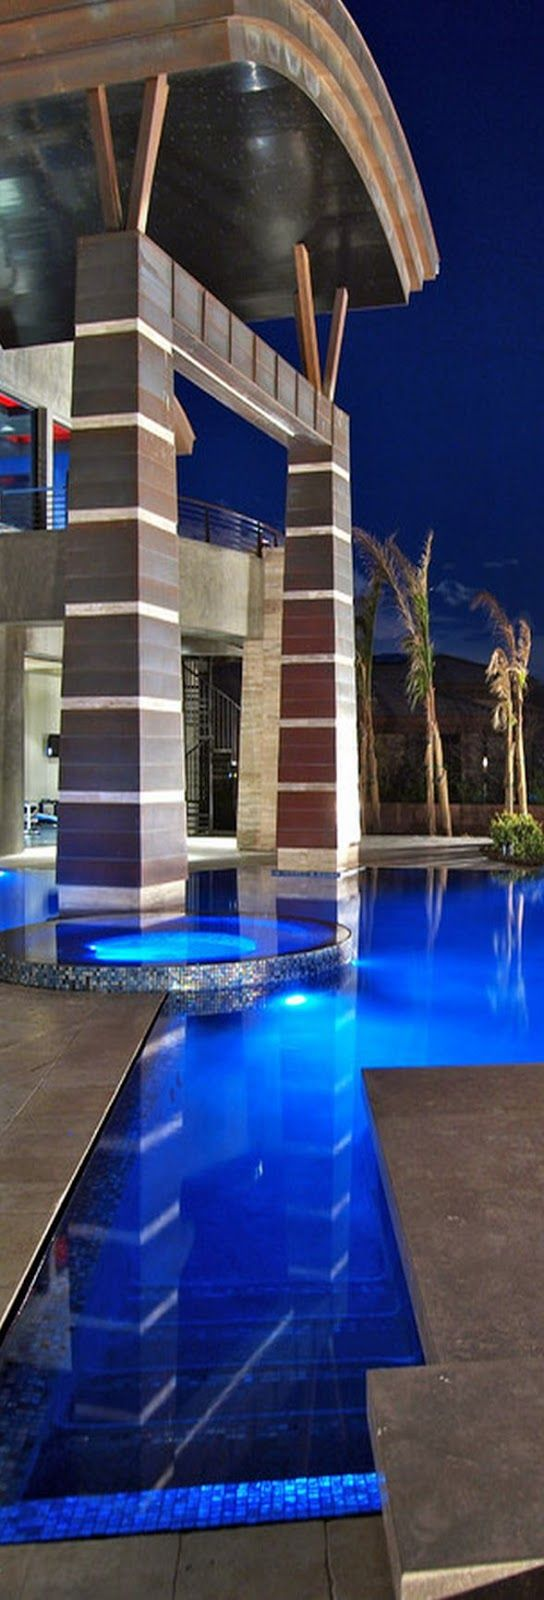 Exquisite Design - Luxury Homes Line The Ocean